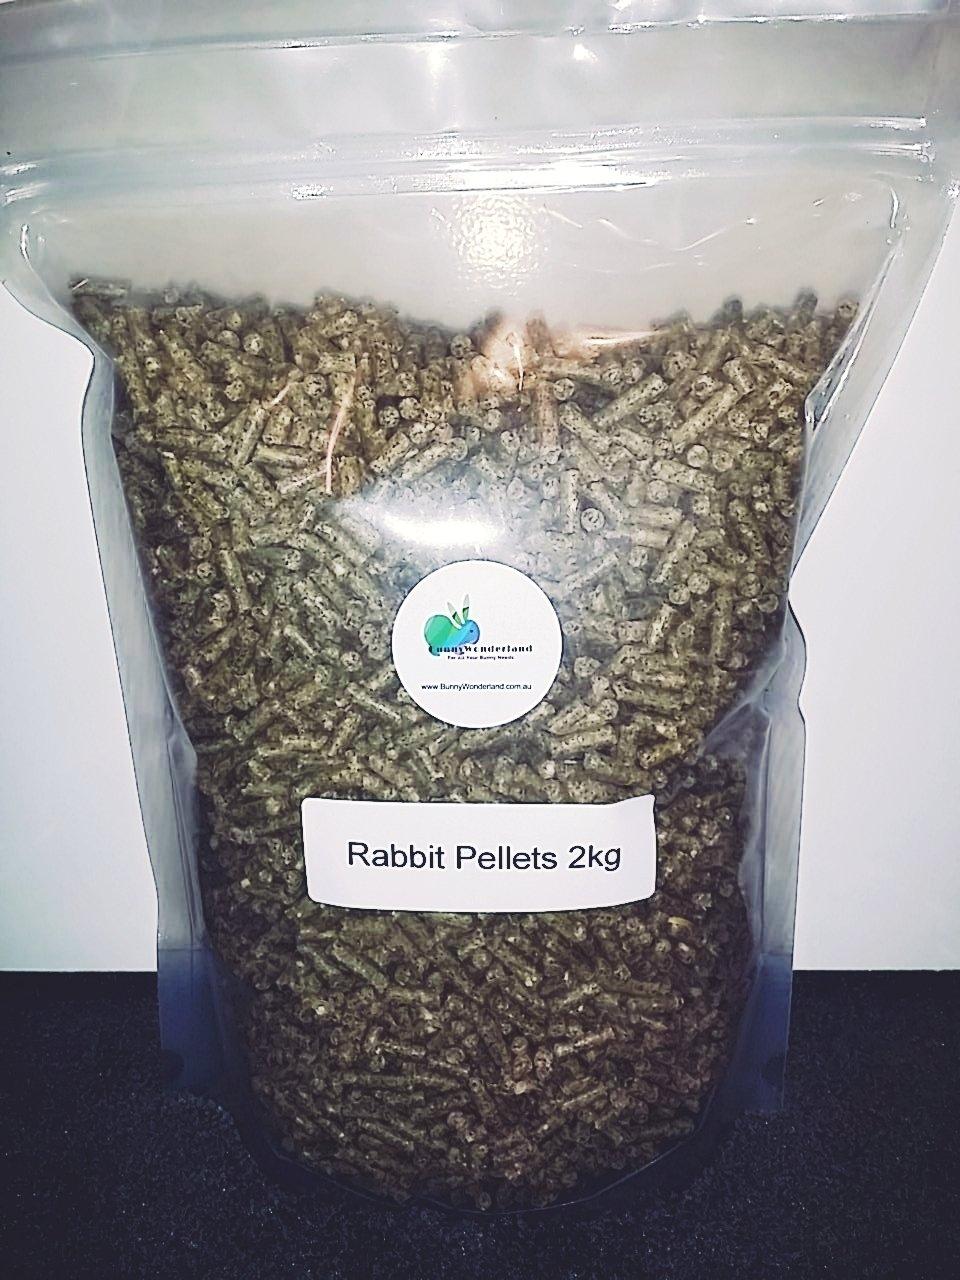 Barastoc Rabbit Pellets 2kg